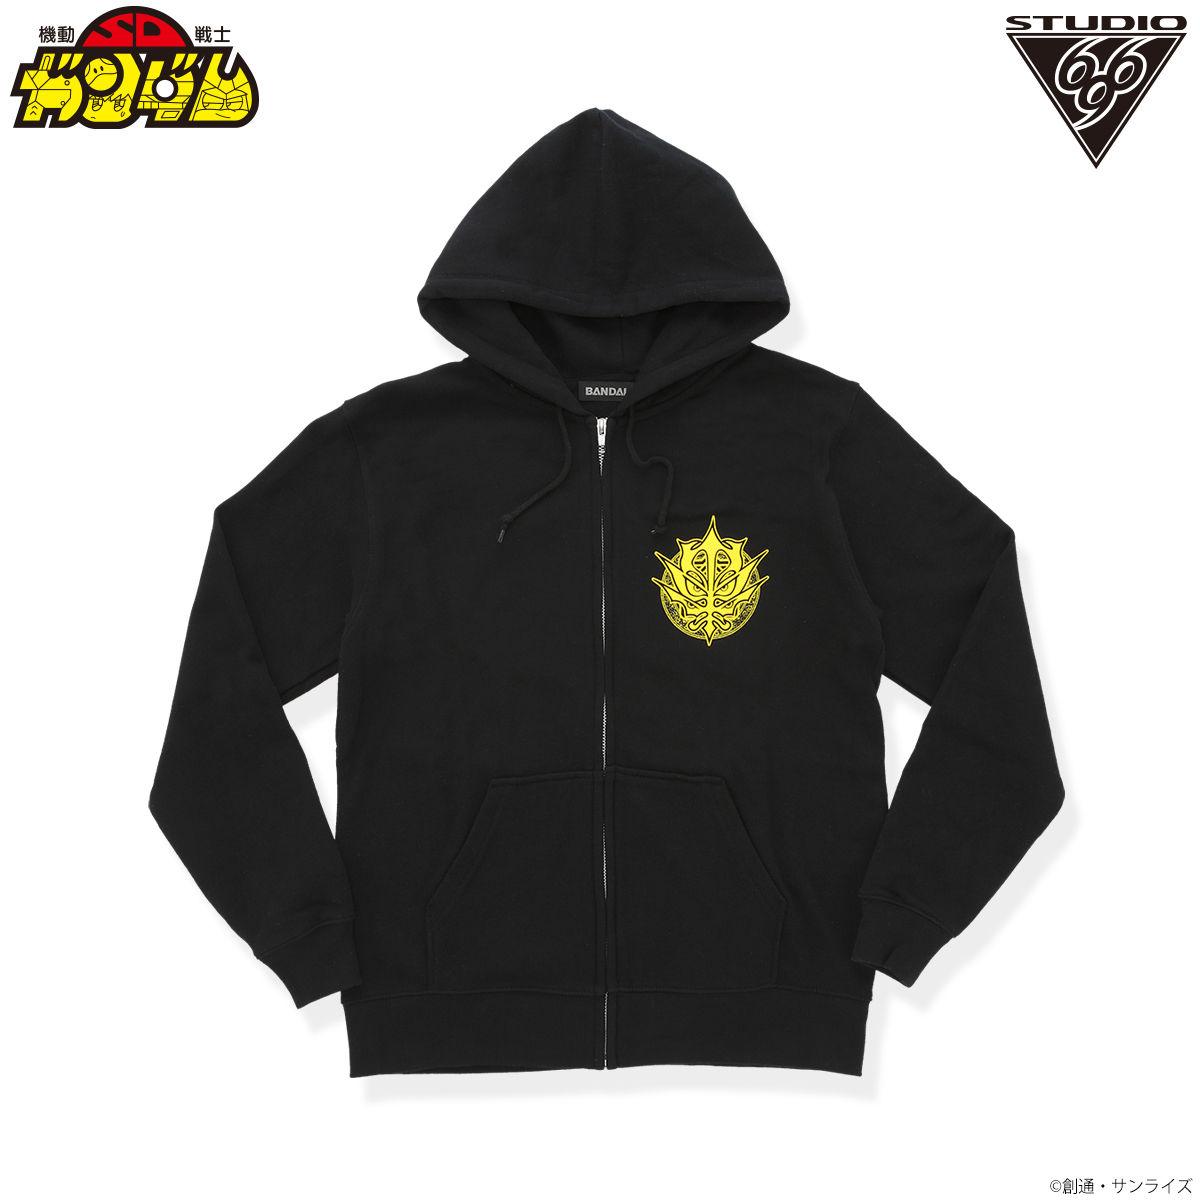 Black Dragon feat. STUDIO696 Hoodie